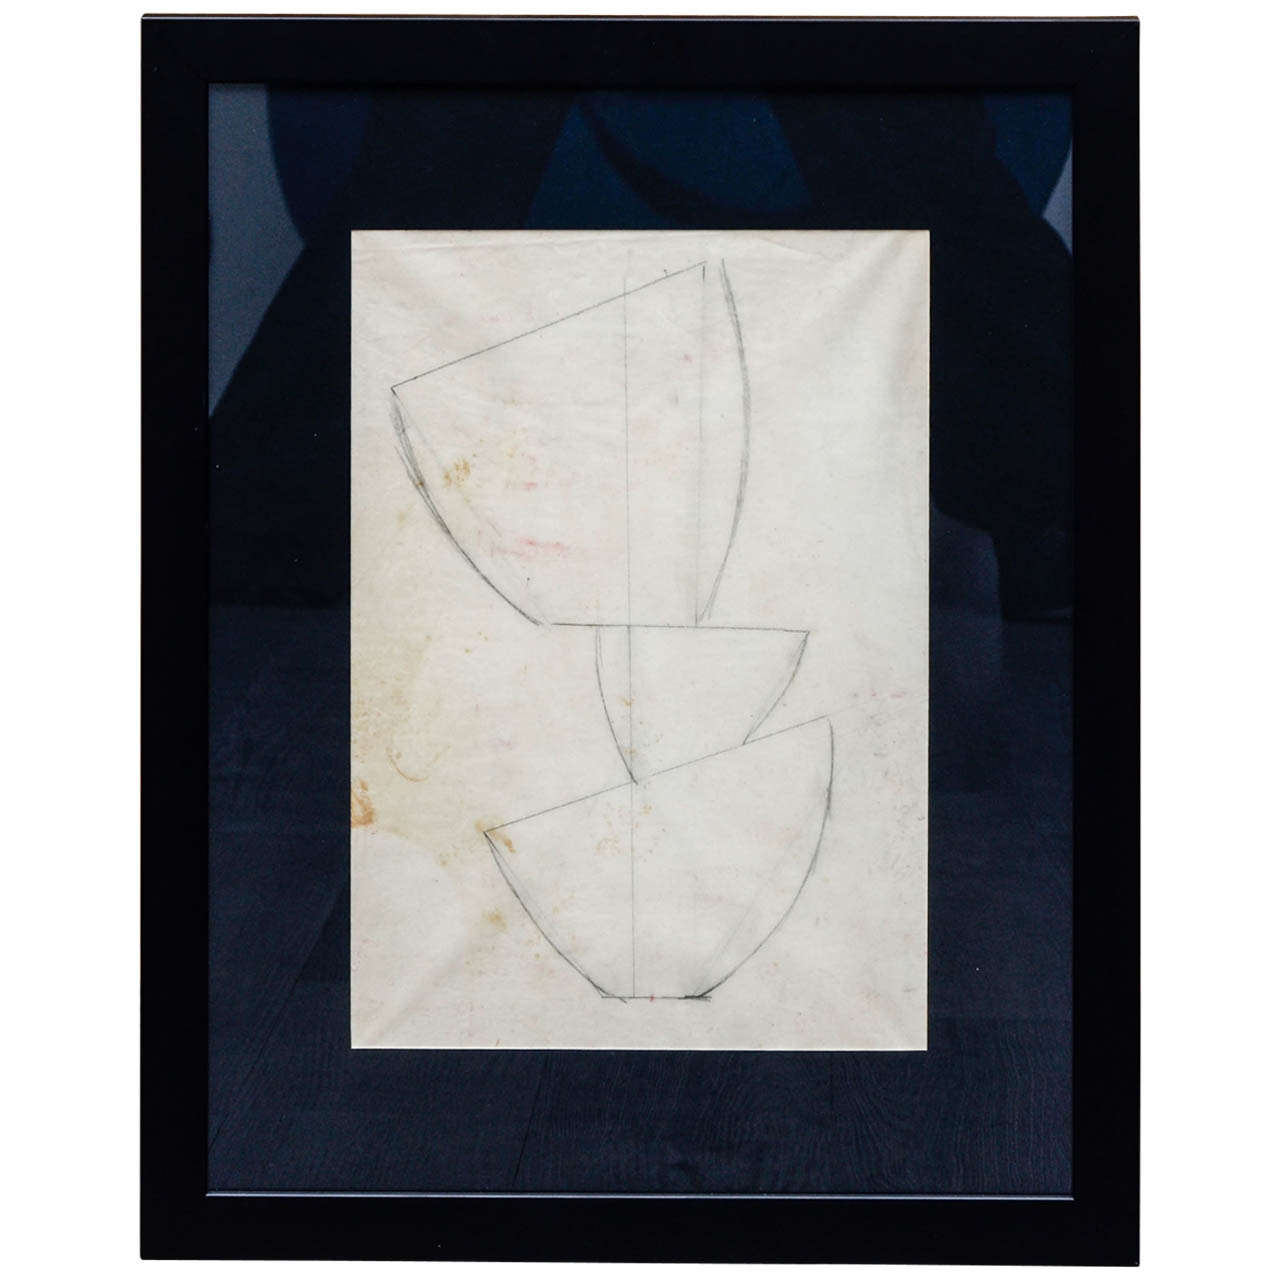 Jean Hans Arp, Pencil Drawing